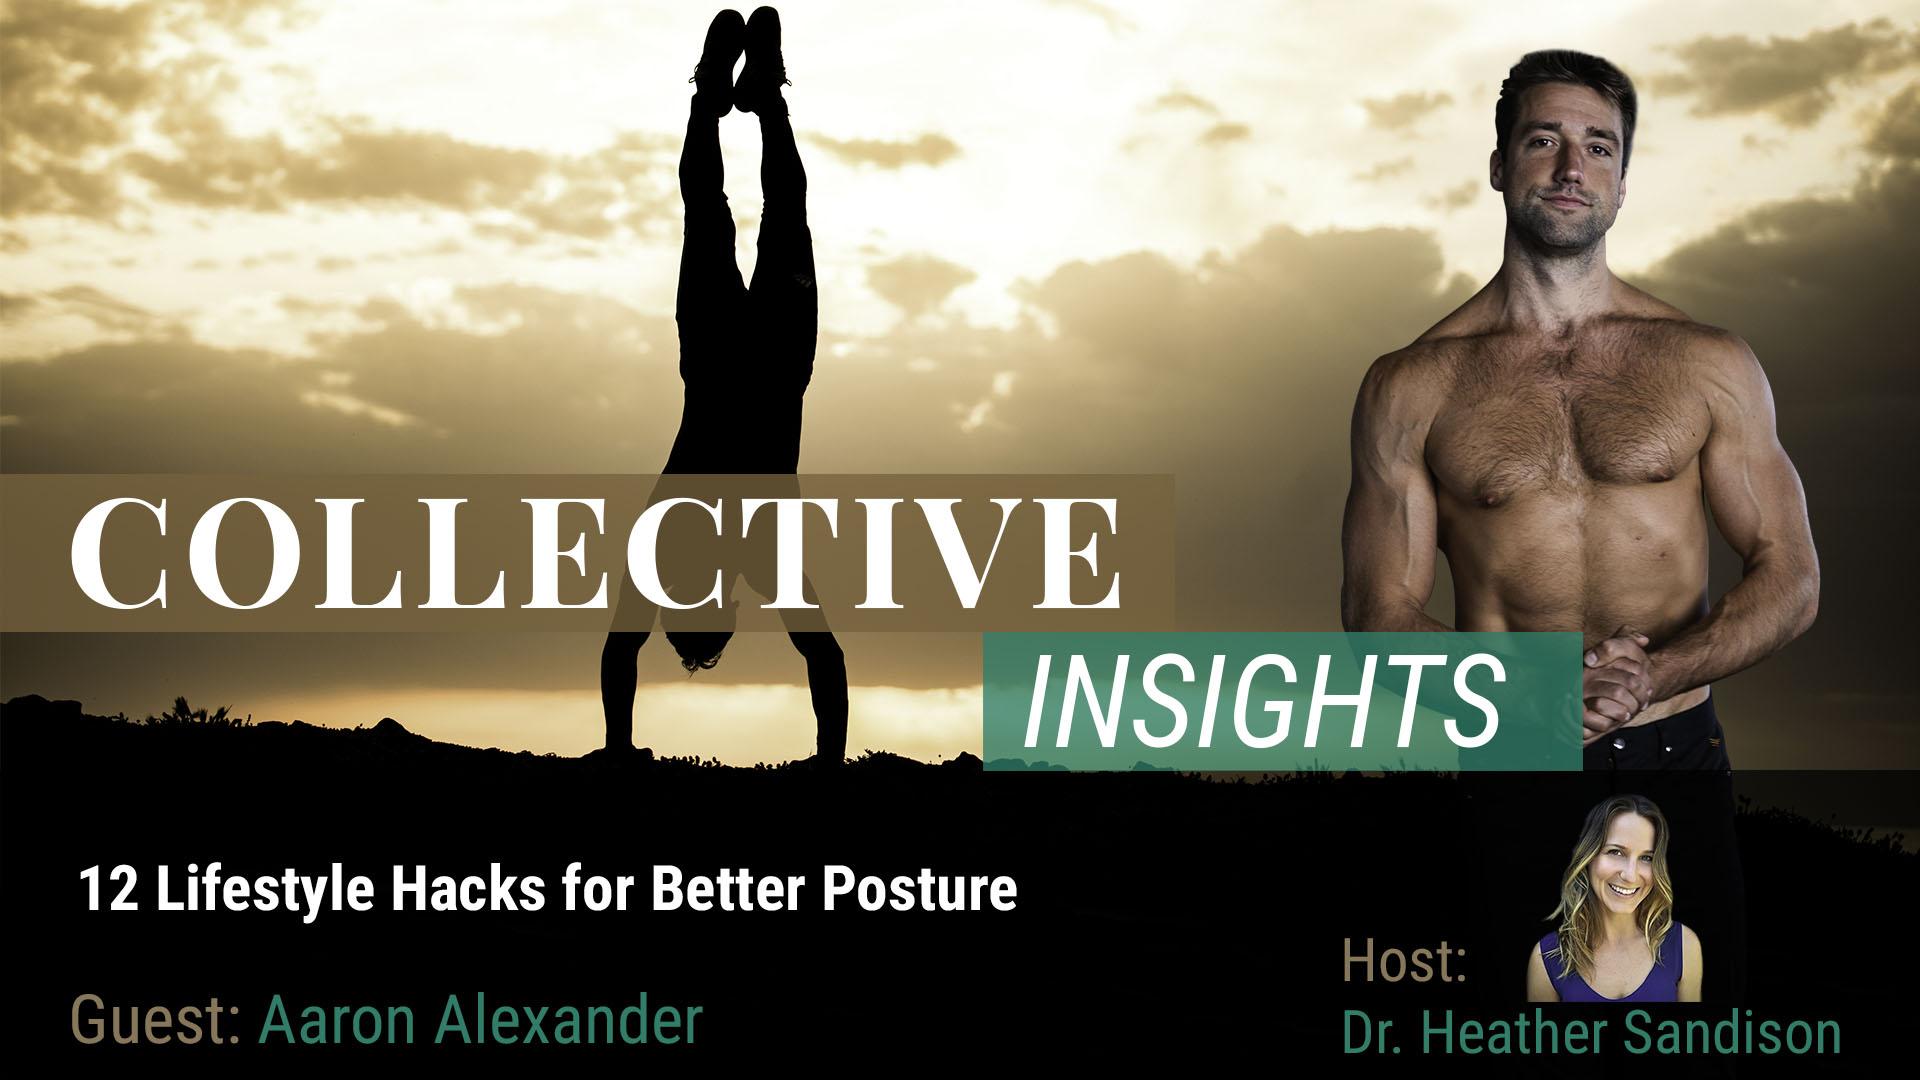 12 Lifestyle Hacks for Better Posture